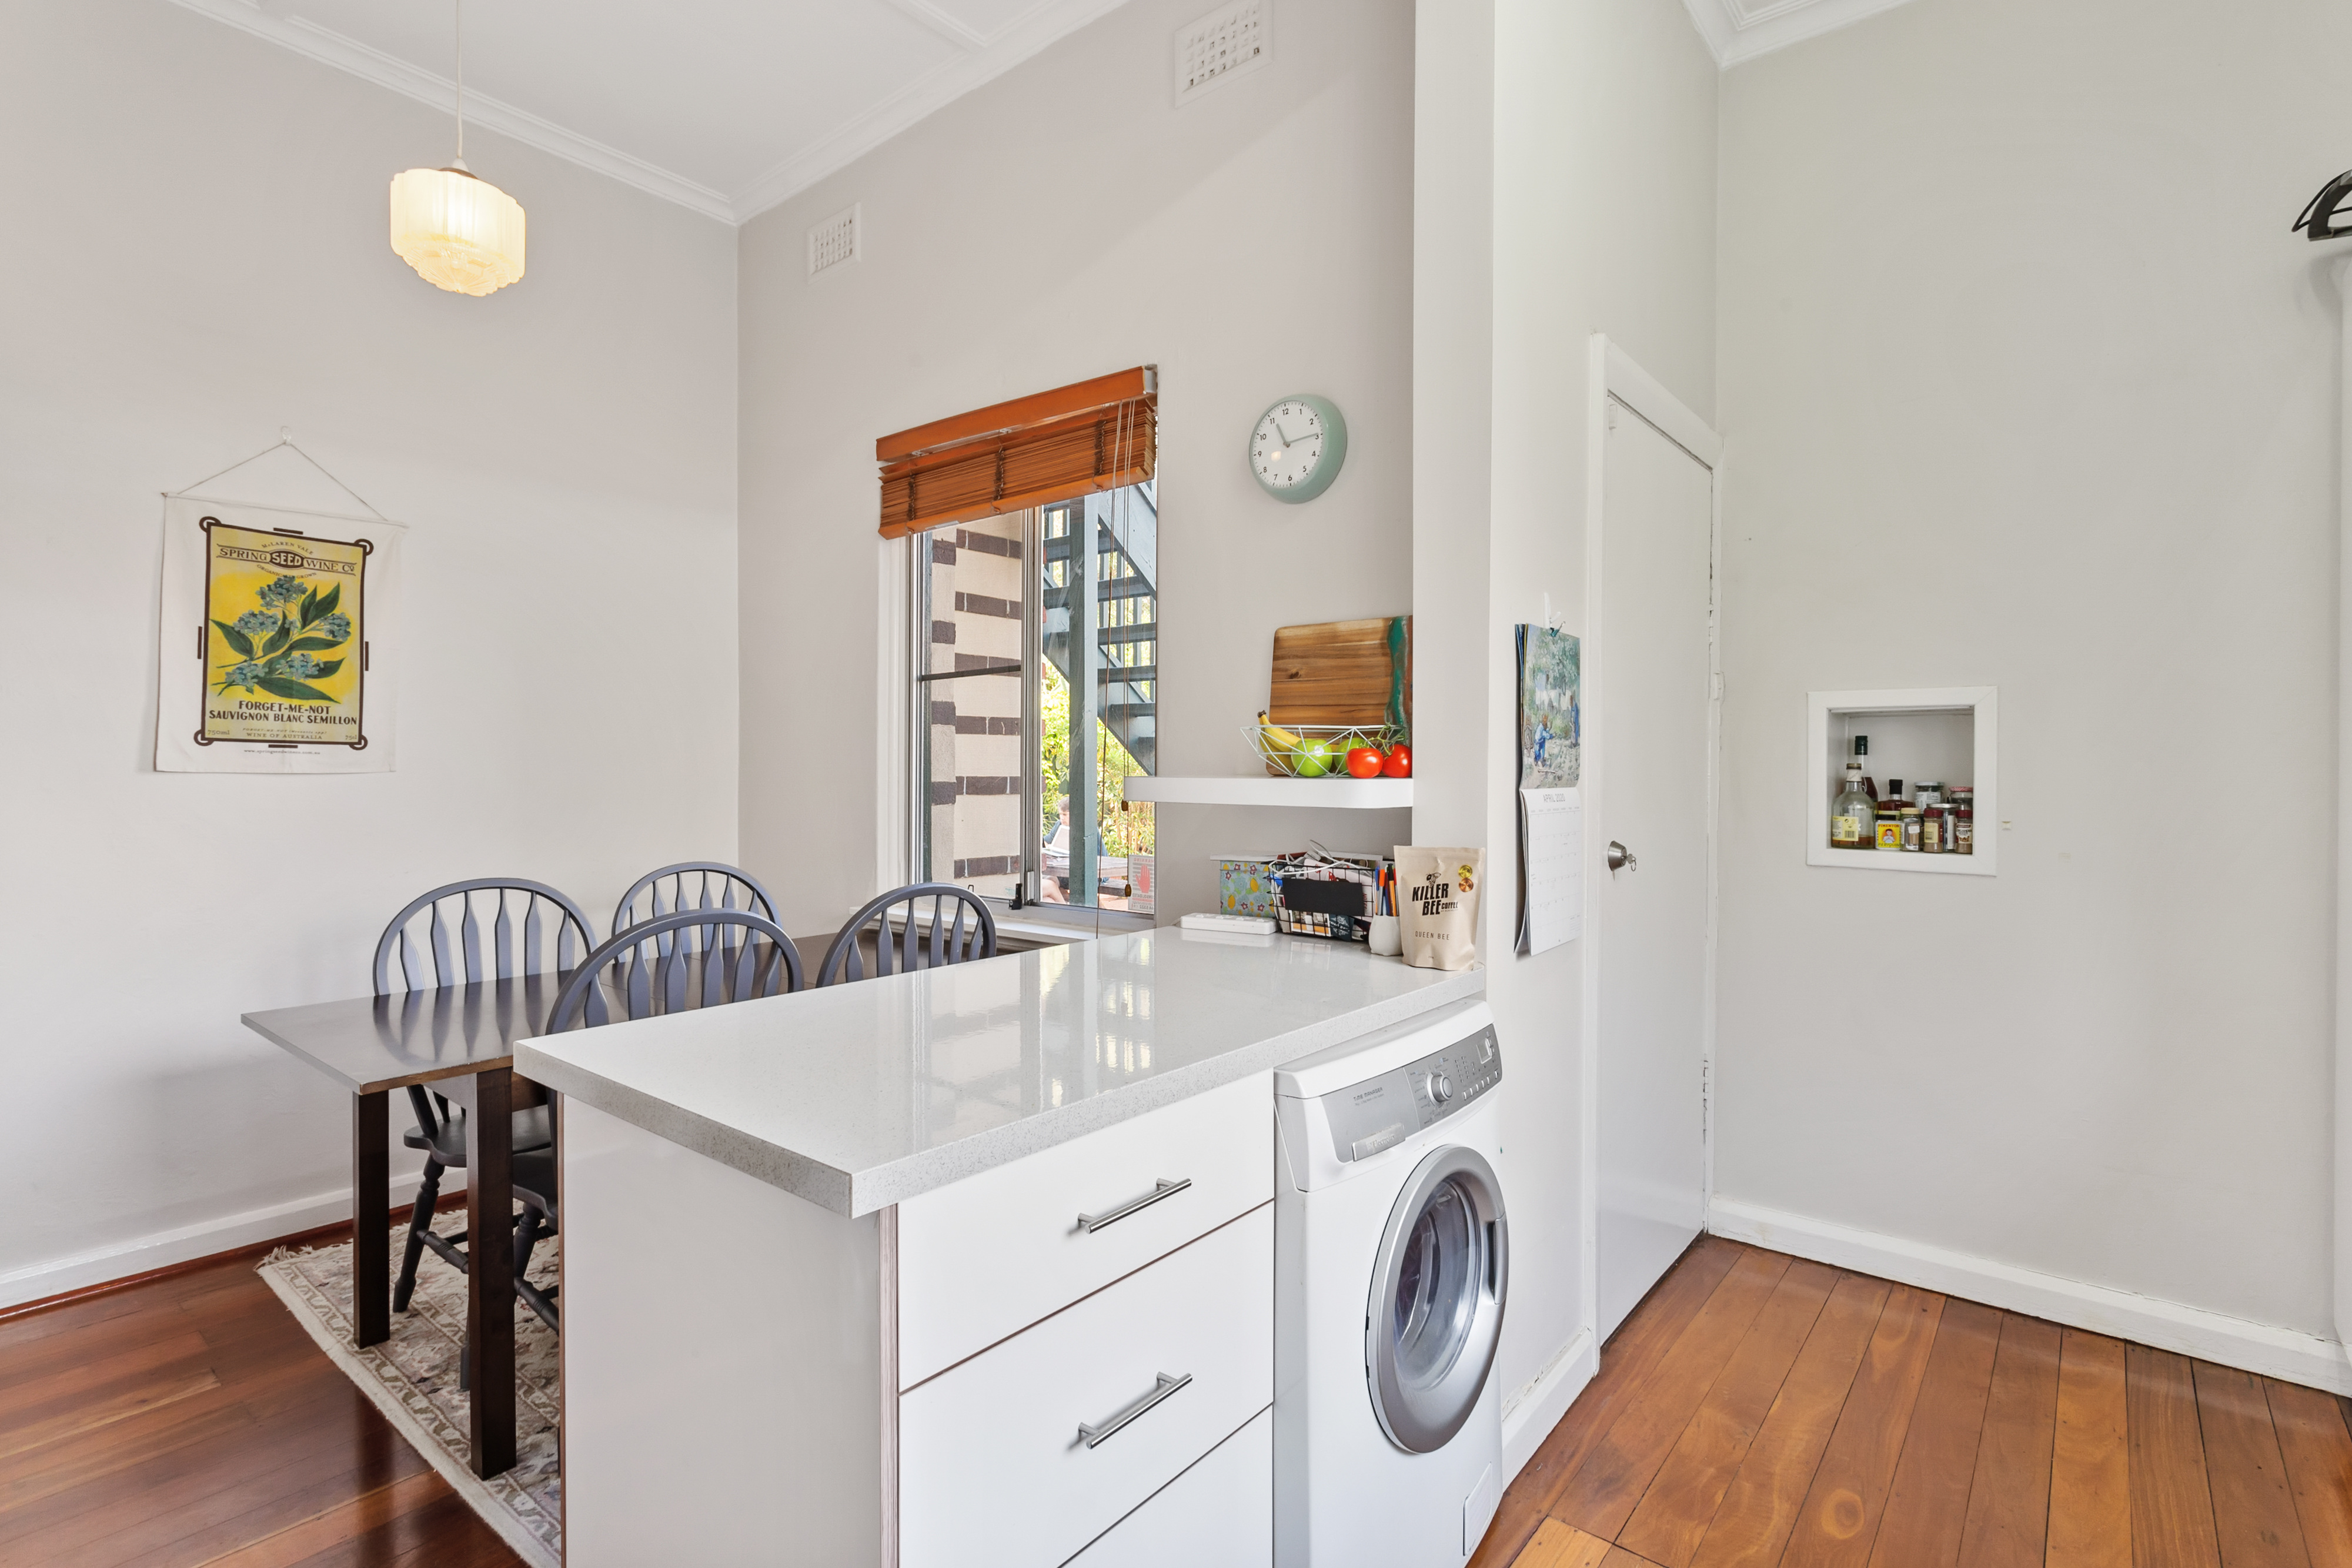 PRINT 1 83 Carr Street, West Perth 14